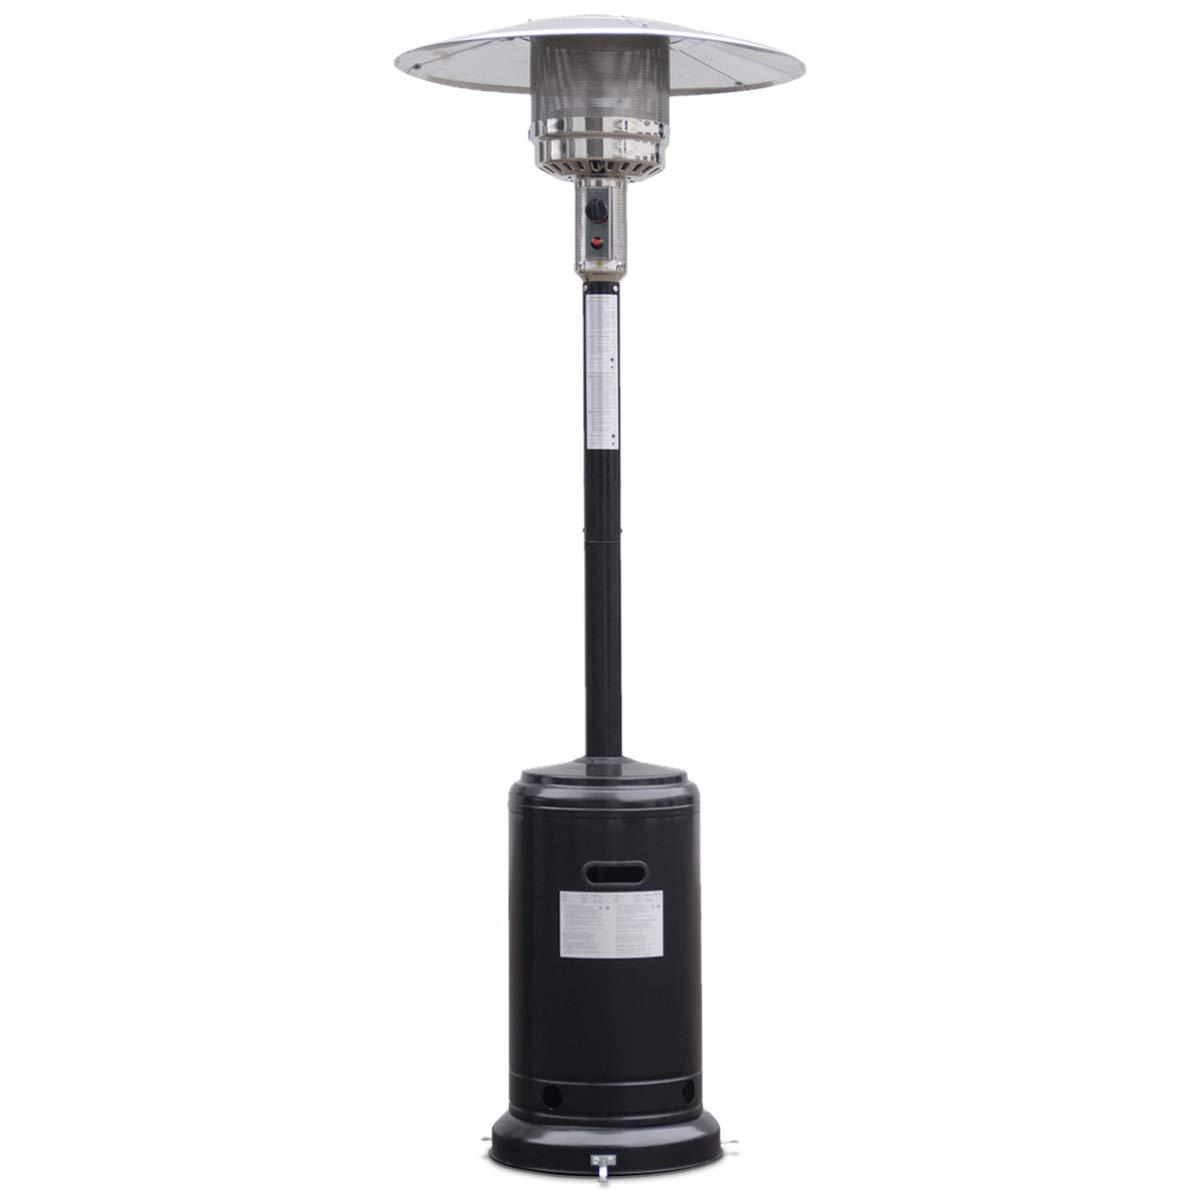 Giantex Steel Outdoor Patio Heater Propane Lp Gas W/accessories (Black) by Giantex